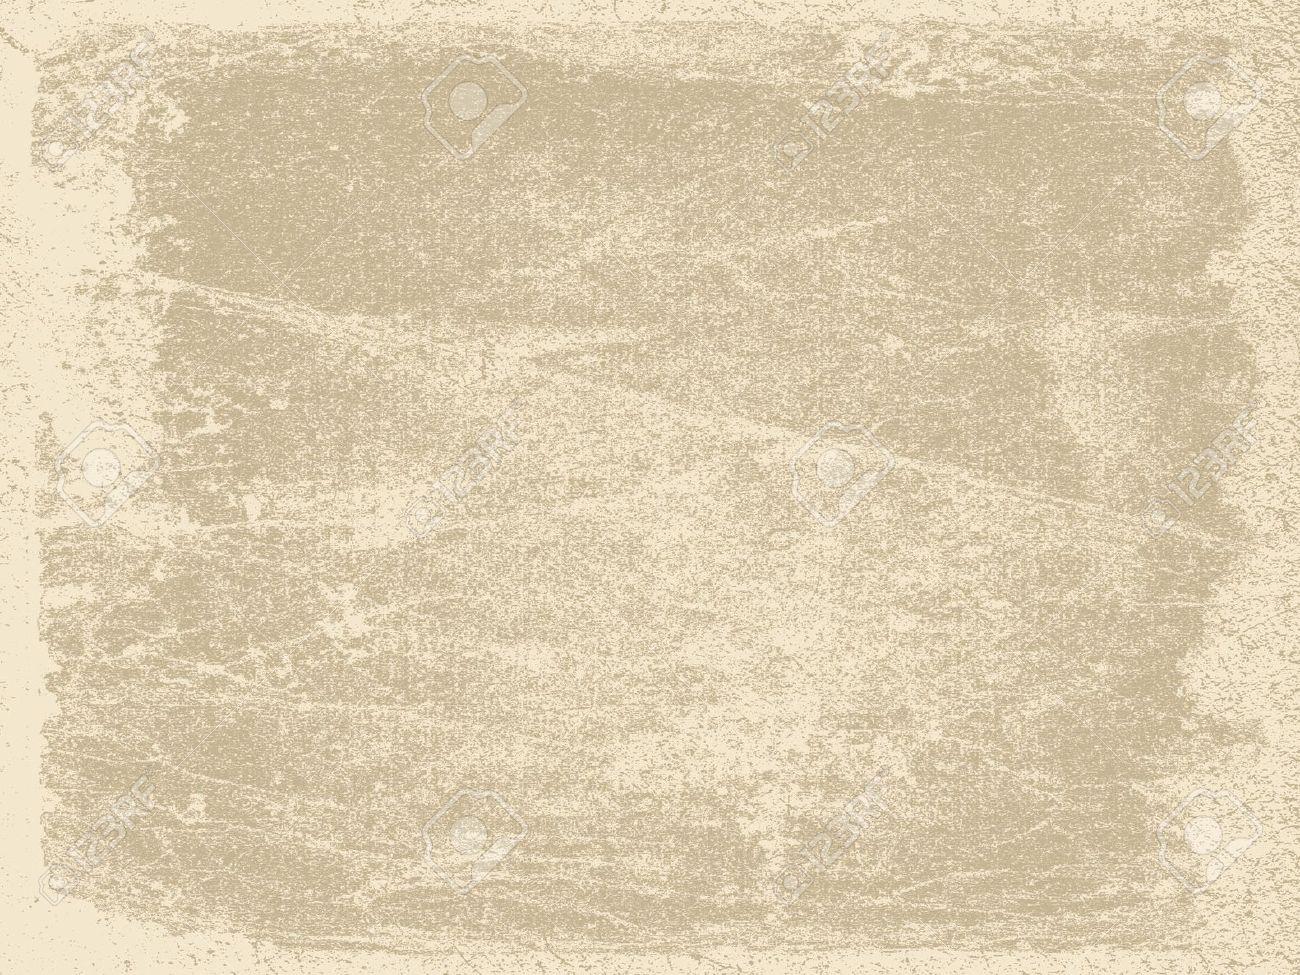 Paper texture clipart #3